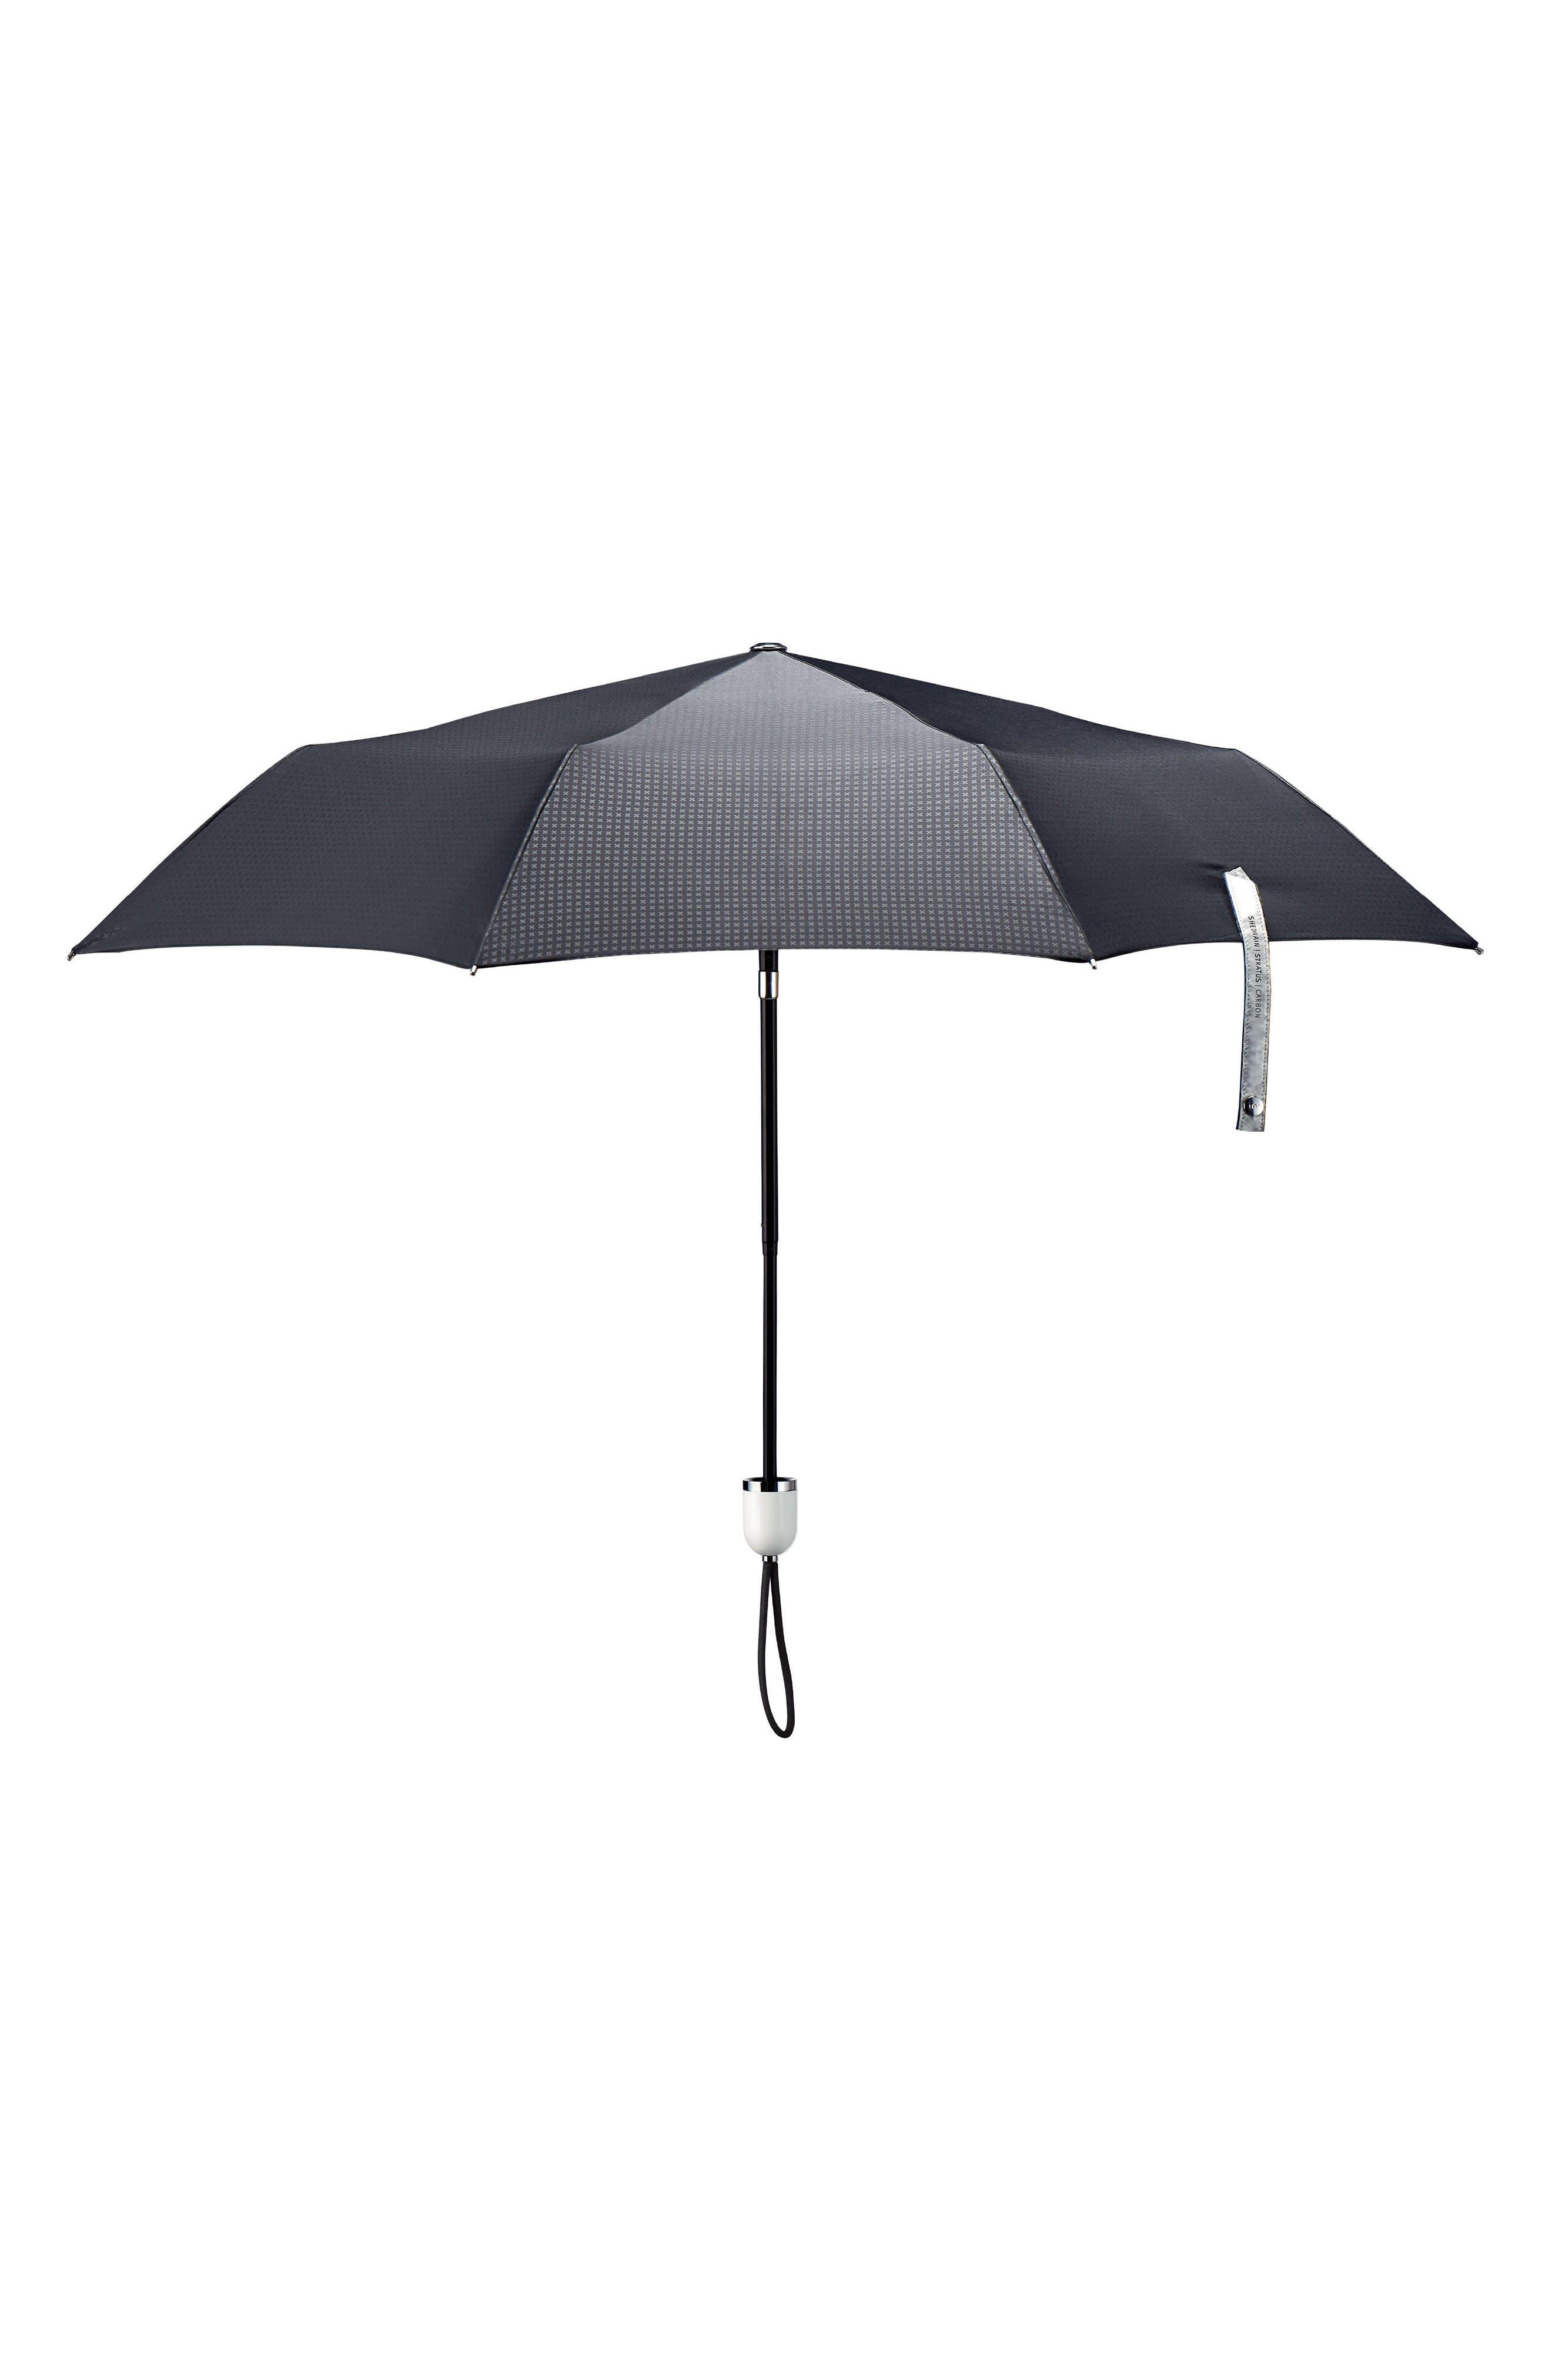 Alternate Image 1 Selected - ShedRain Stratus Auto Open Compact Umbrella